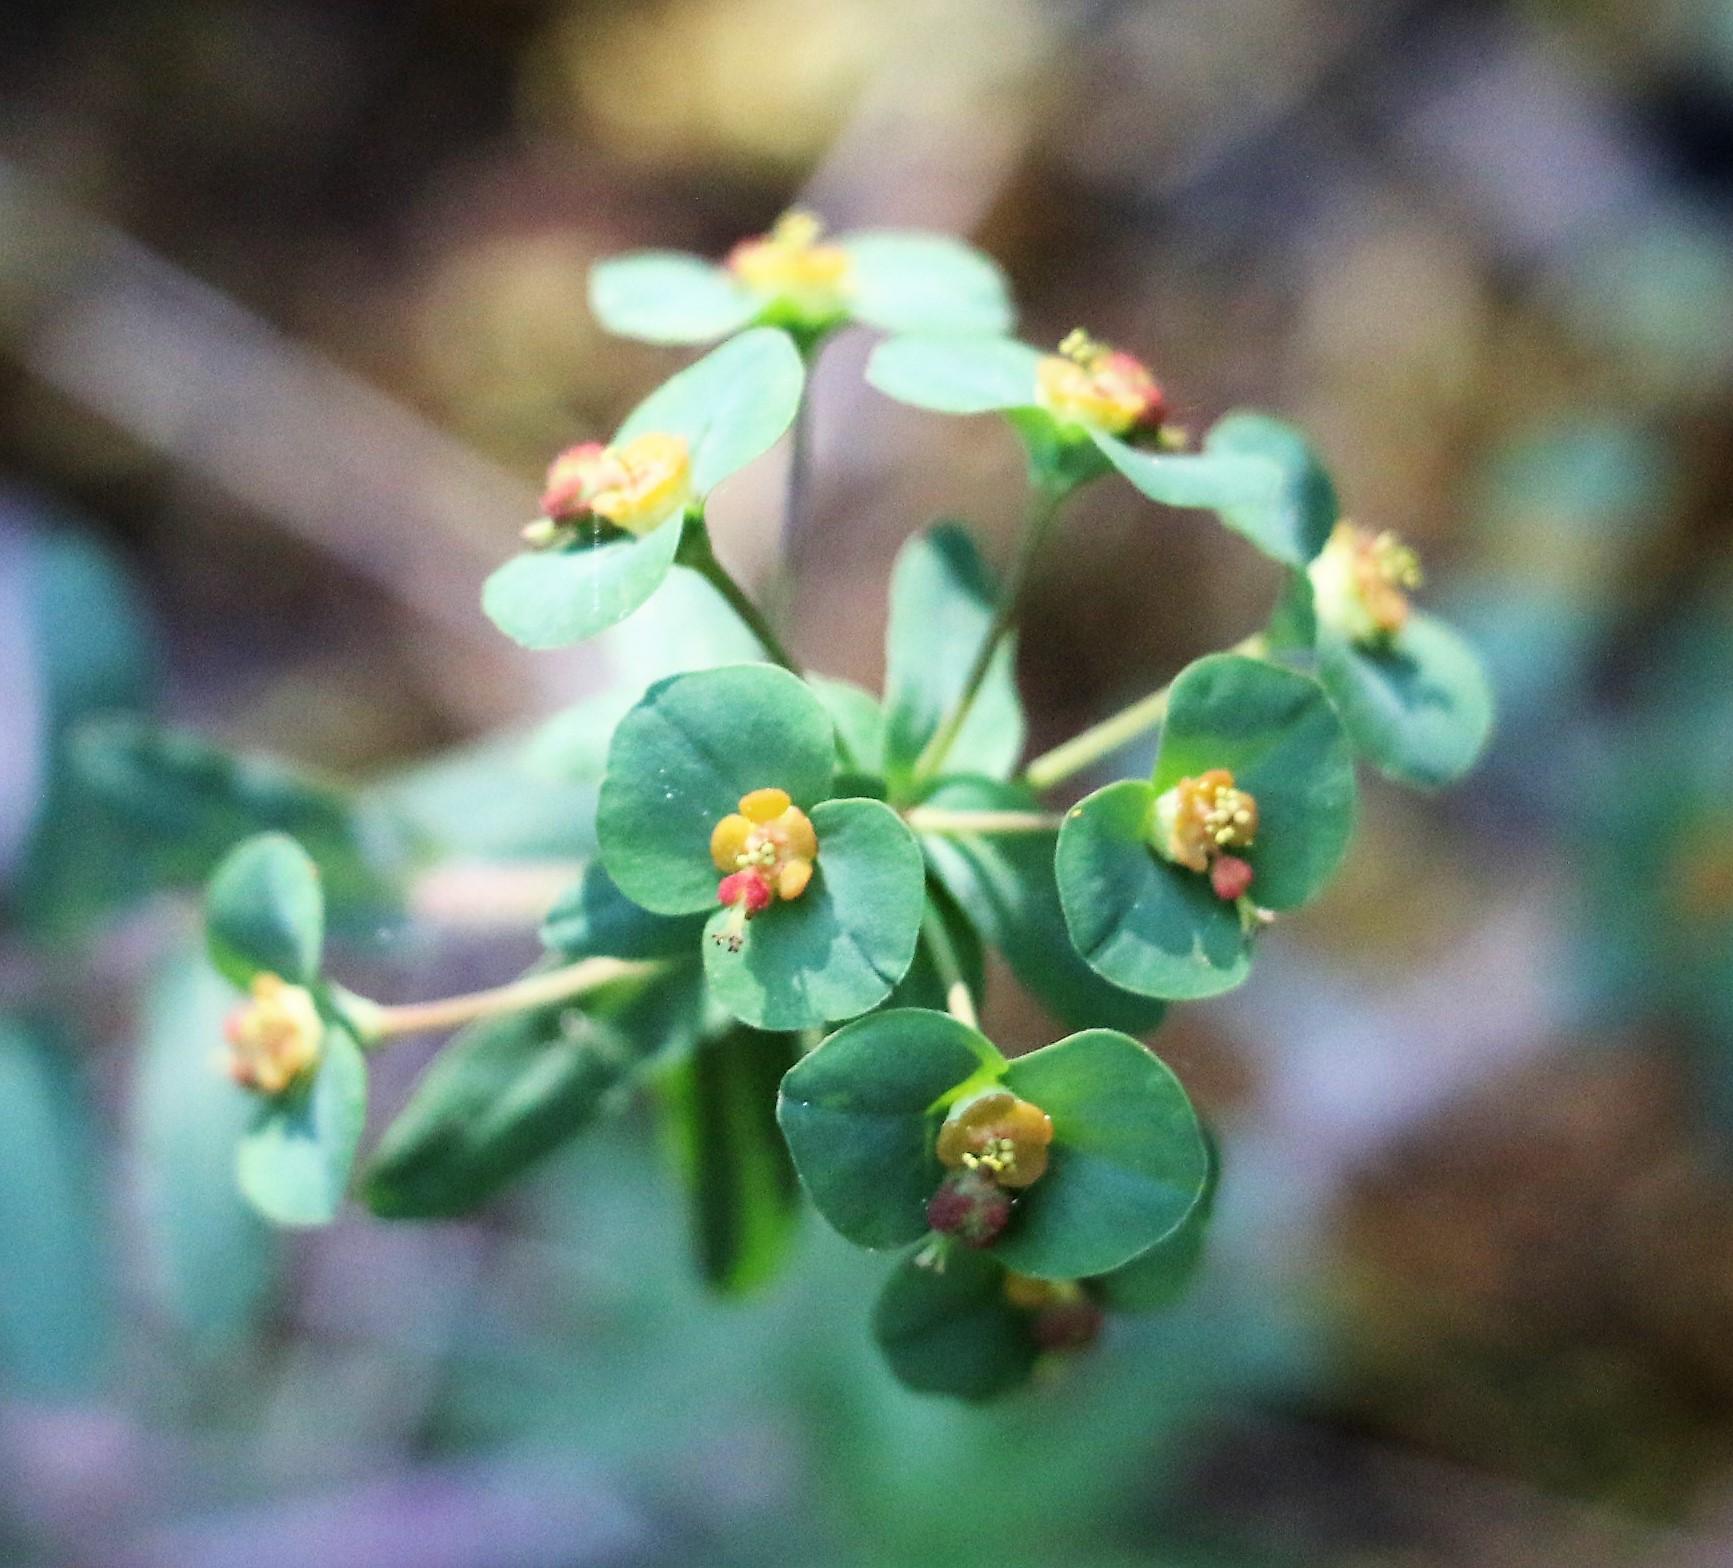 Euphorbia platyphyllos.